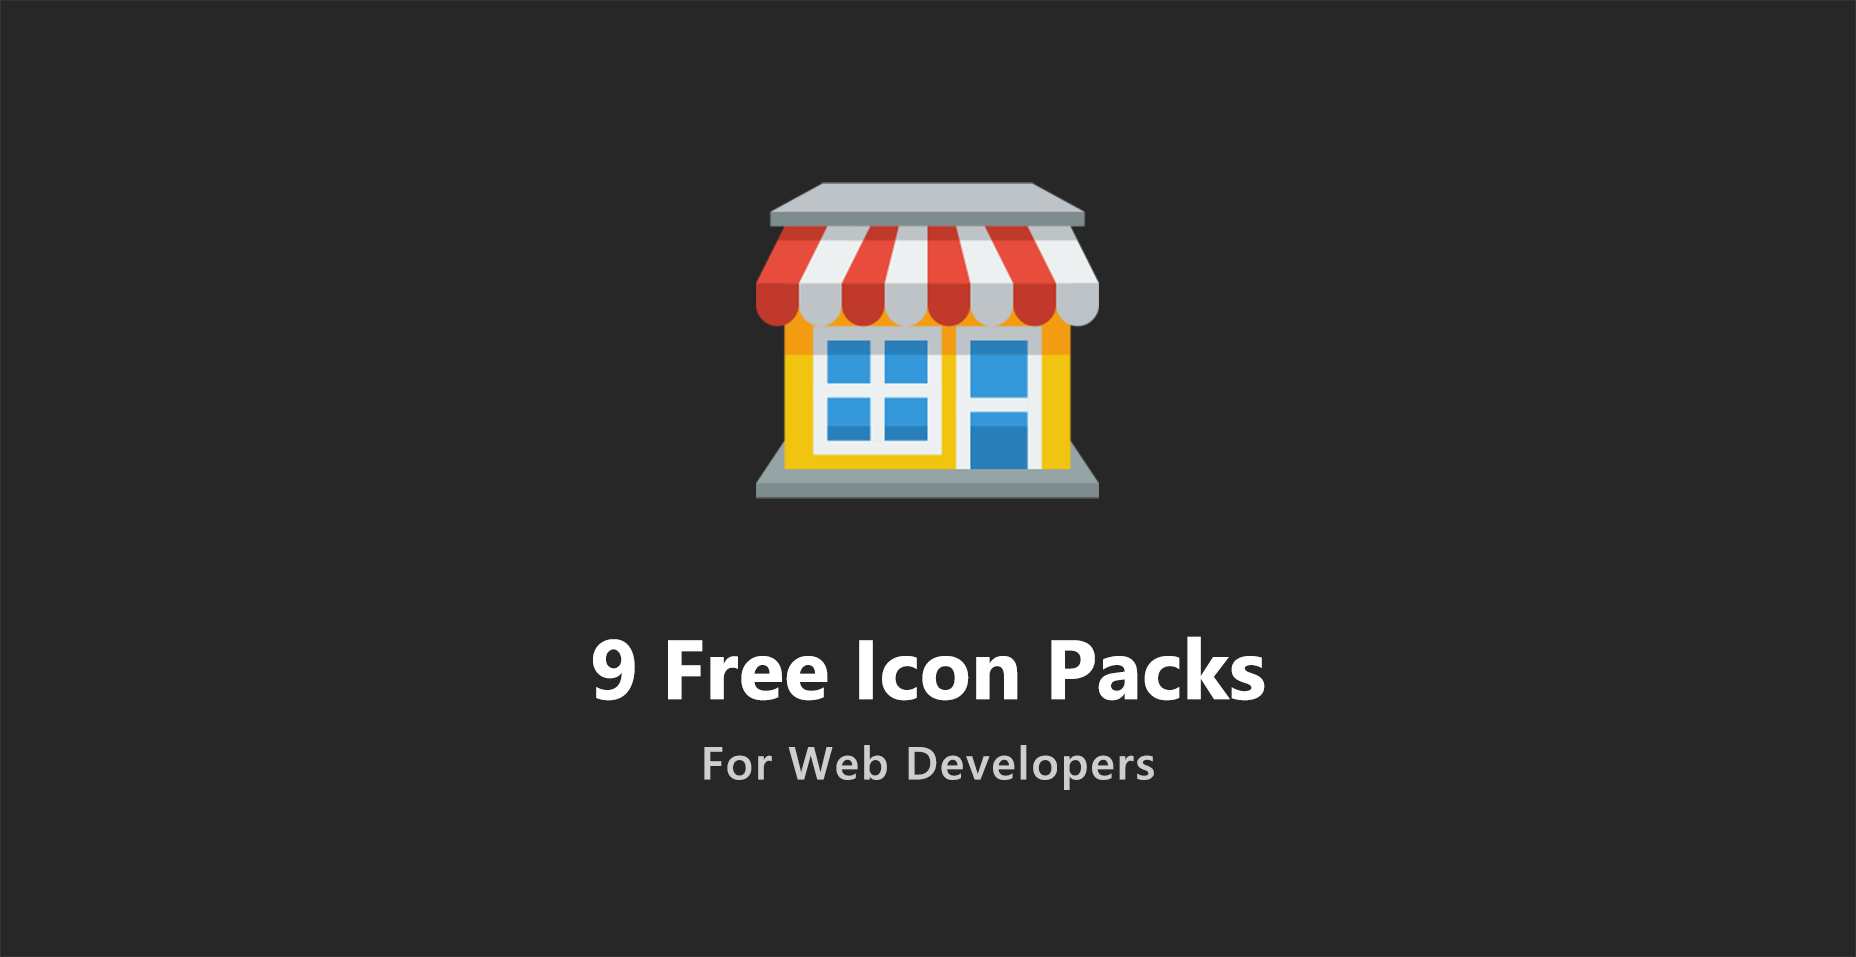 9 Free Icon Packs For Web Developers - Tutorialzine